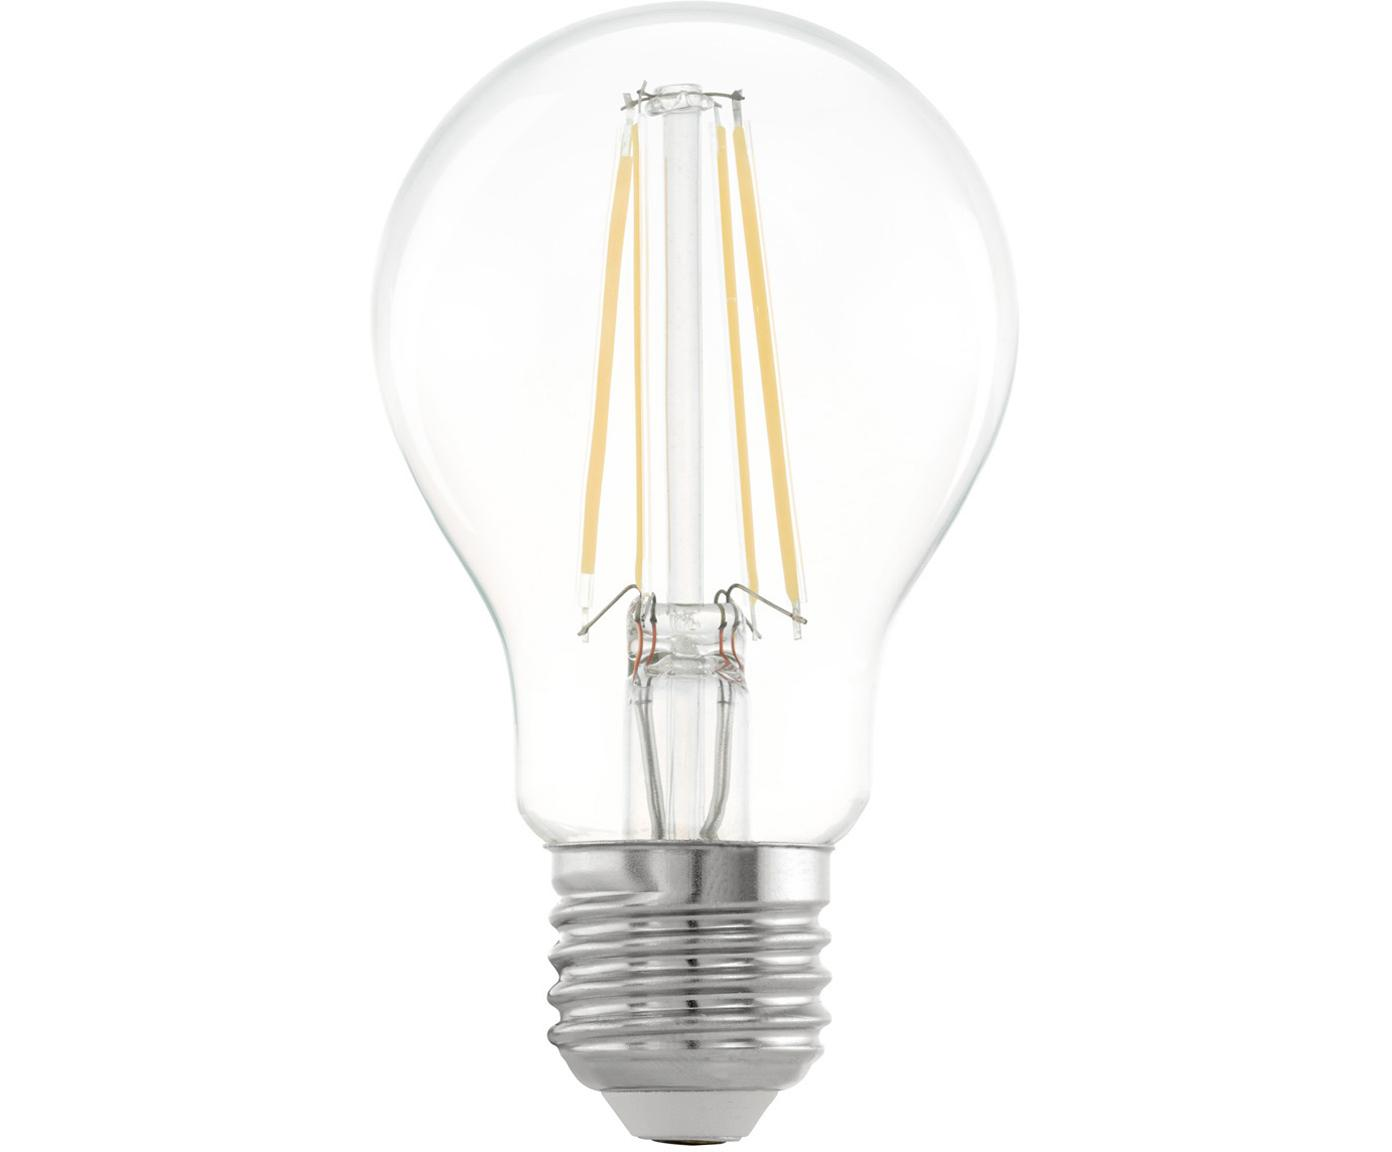 Żarówka LED Cord (E27 / 6 W) 5 szt., Transparentny, Ø 6 x W 10 cm